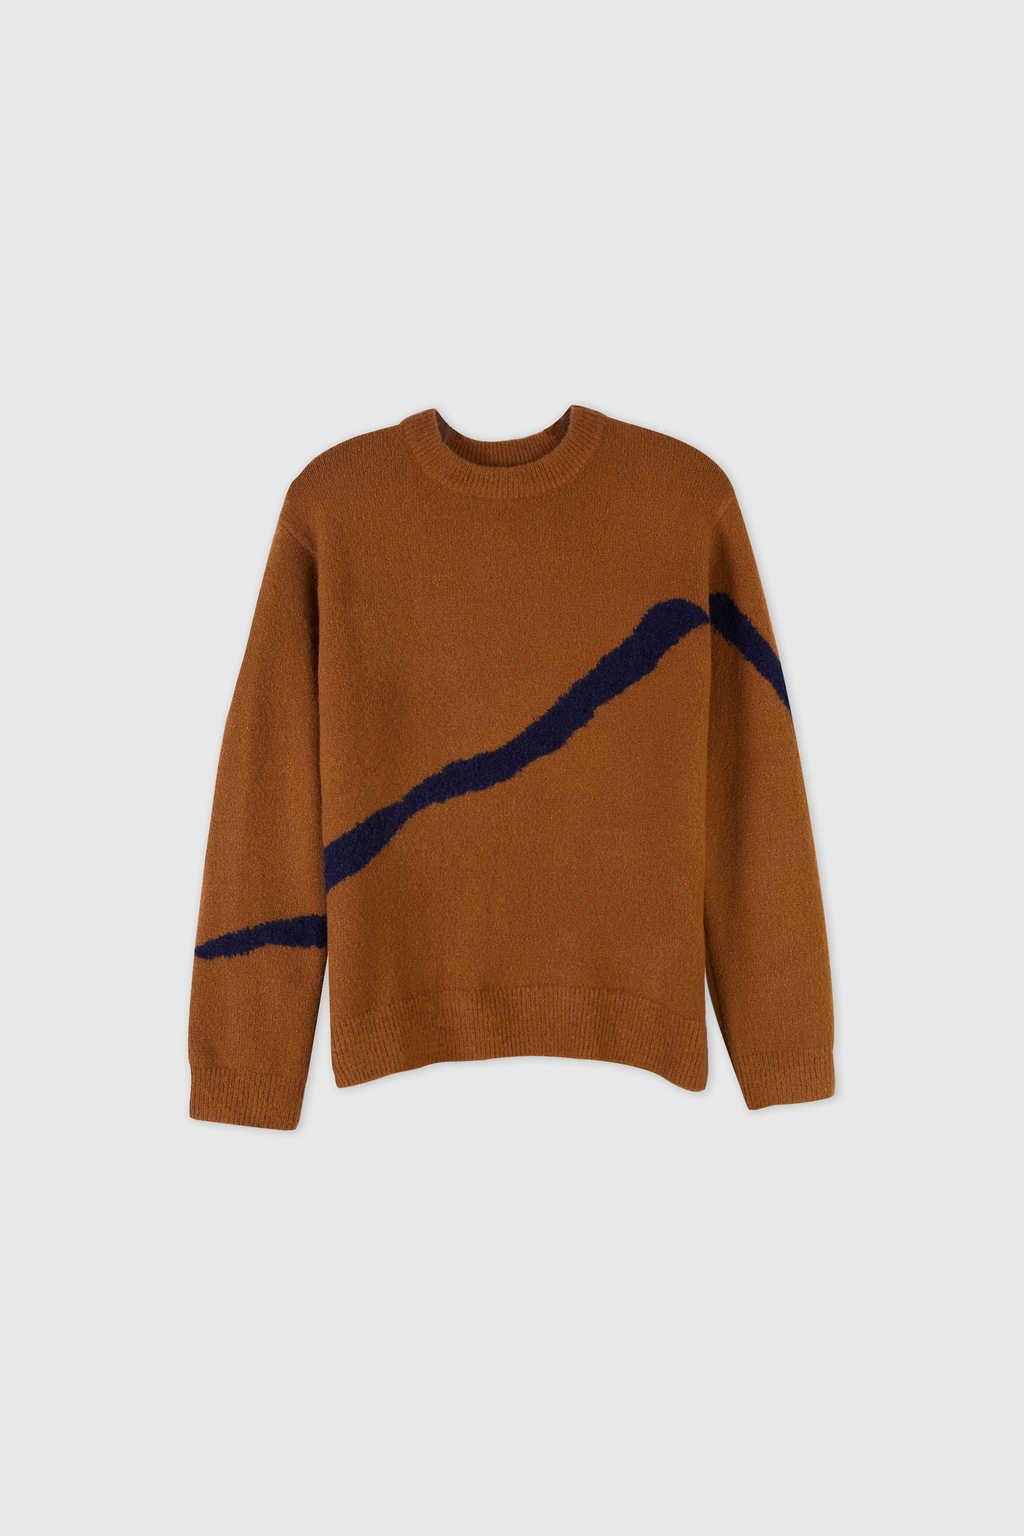 Sweater 2710 Mustard 10